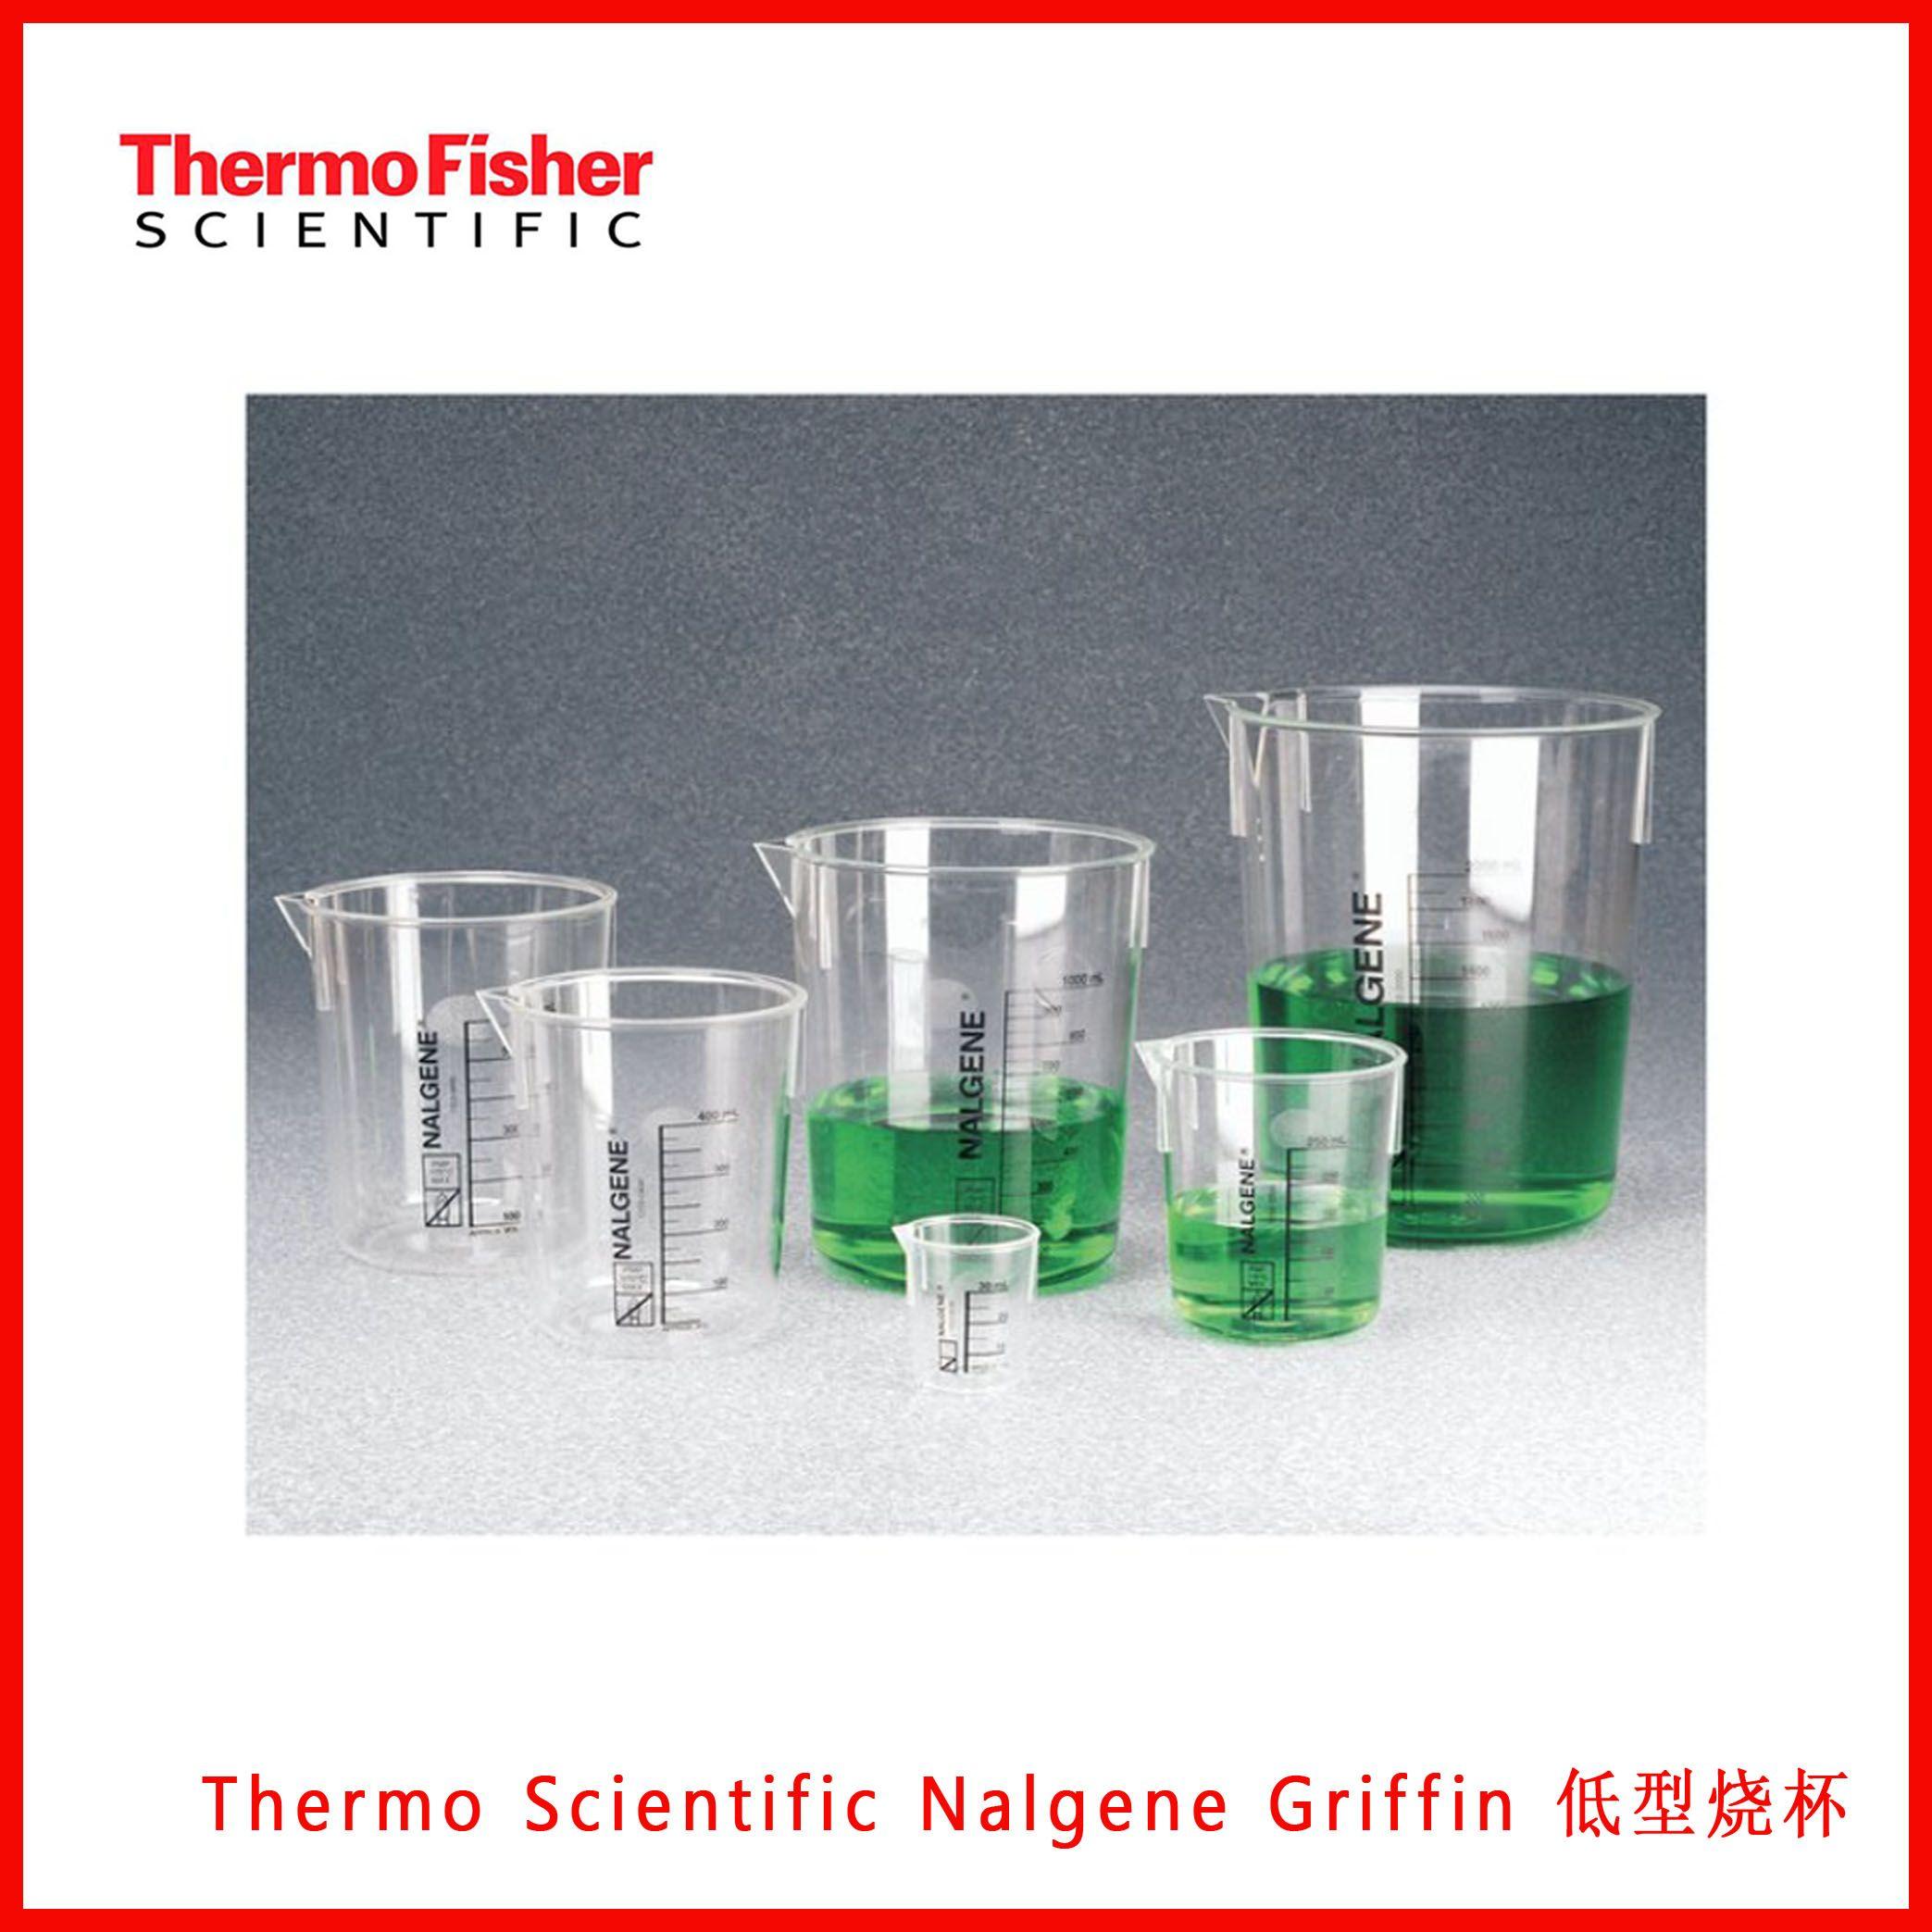 Thermo Scientific Nalgene Griffin 低型烧杯12030030,12030050,现货